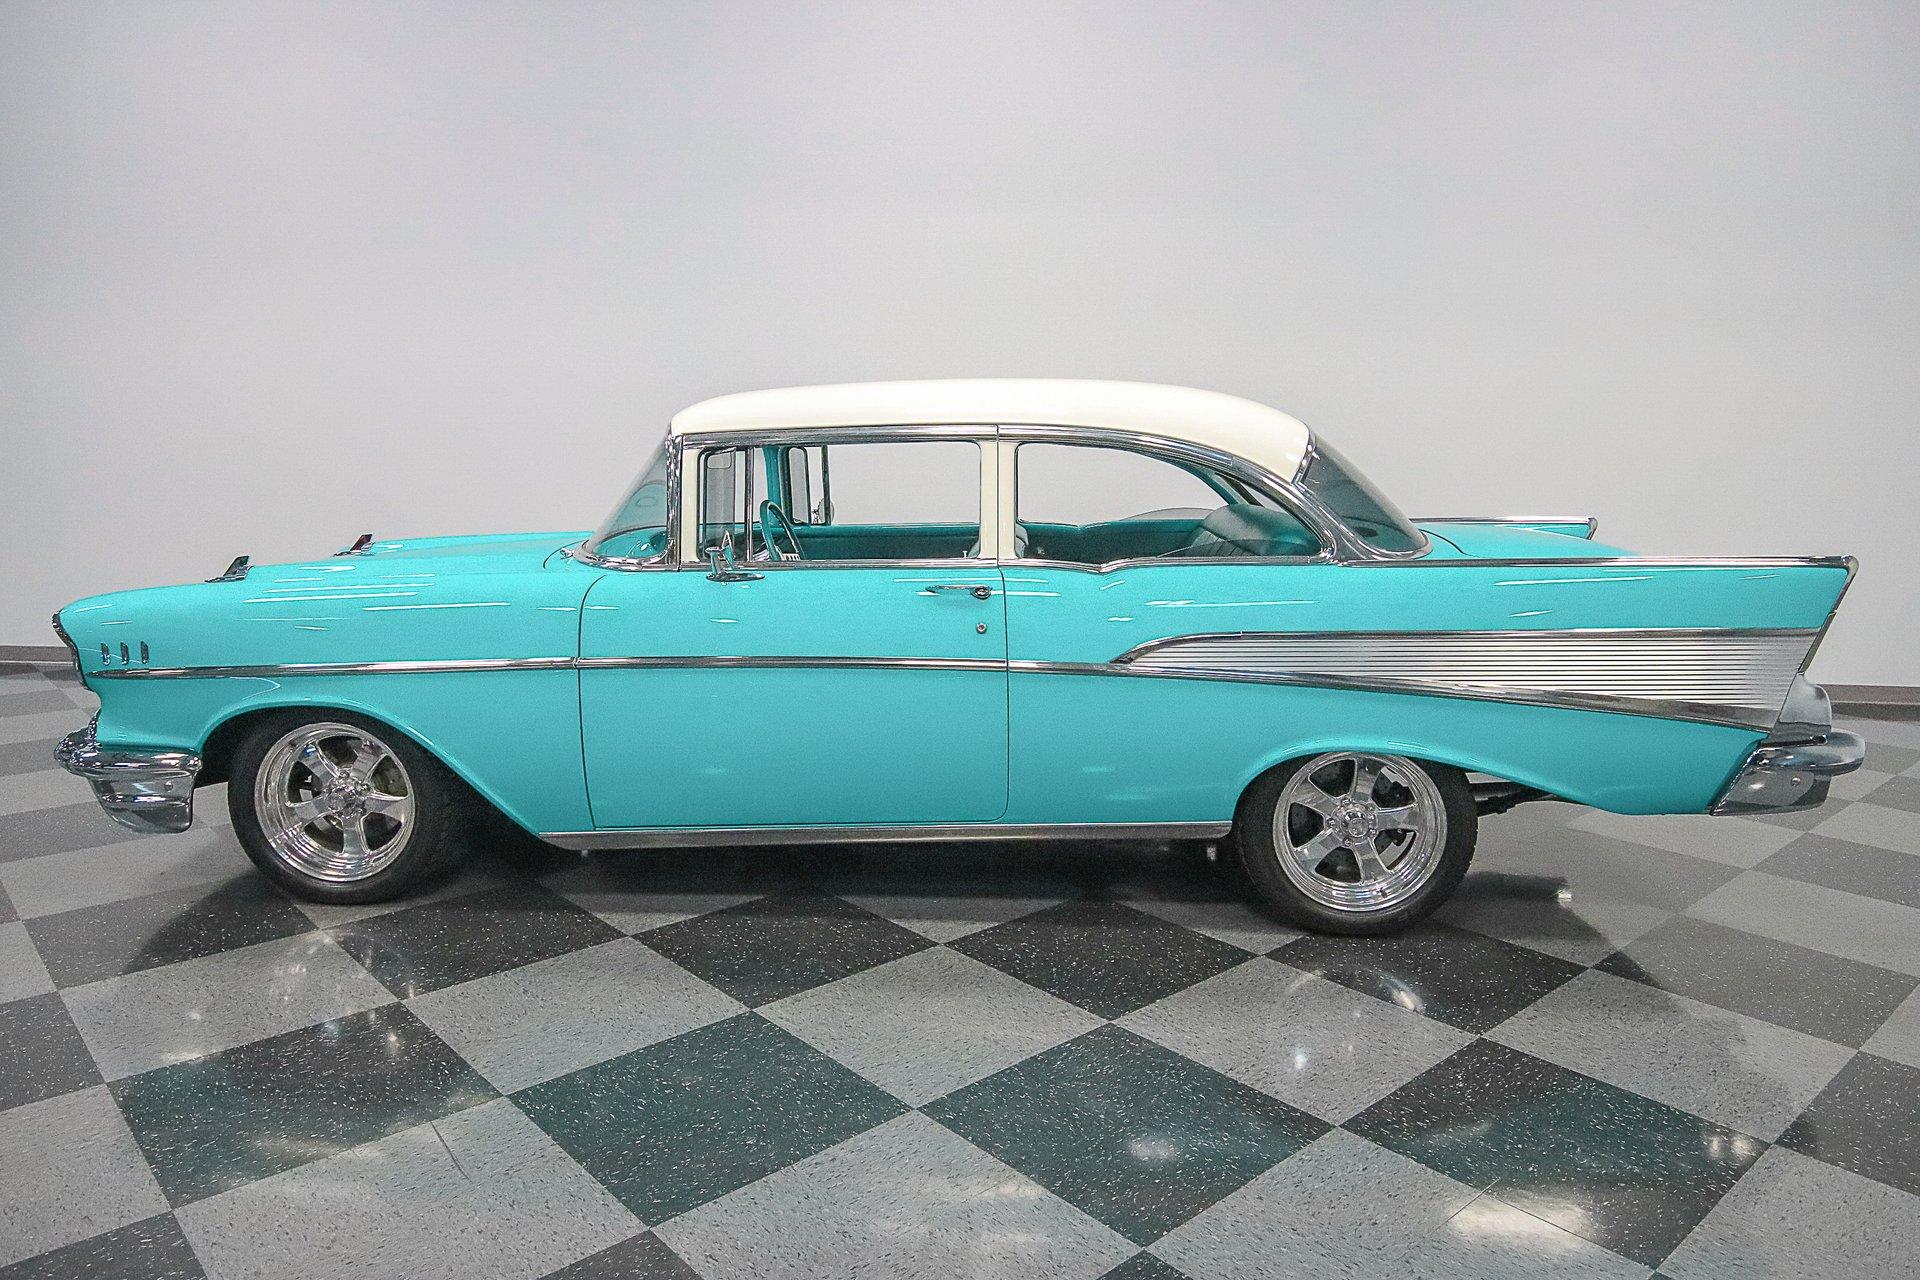 1957 chevrolet bel air 2 door sedan